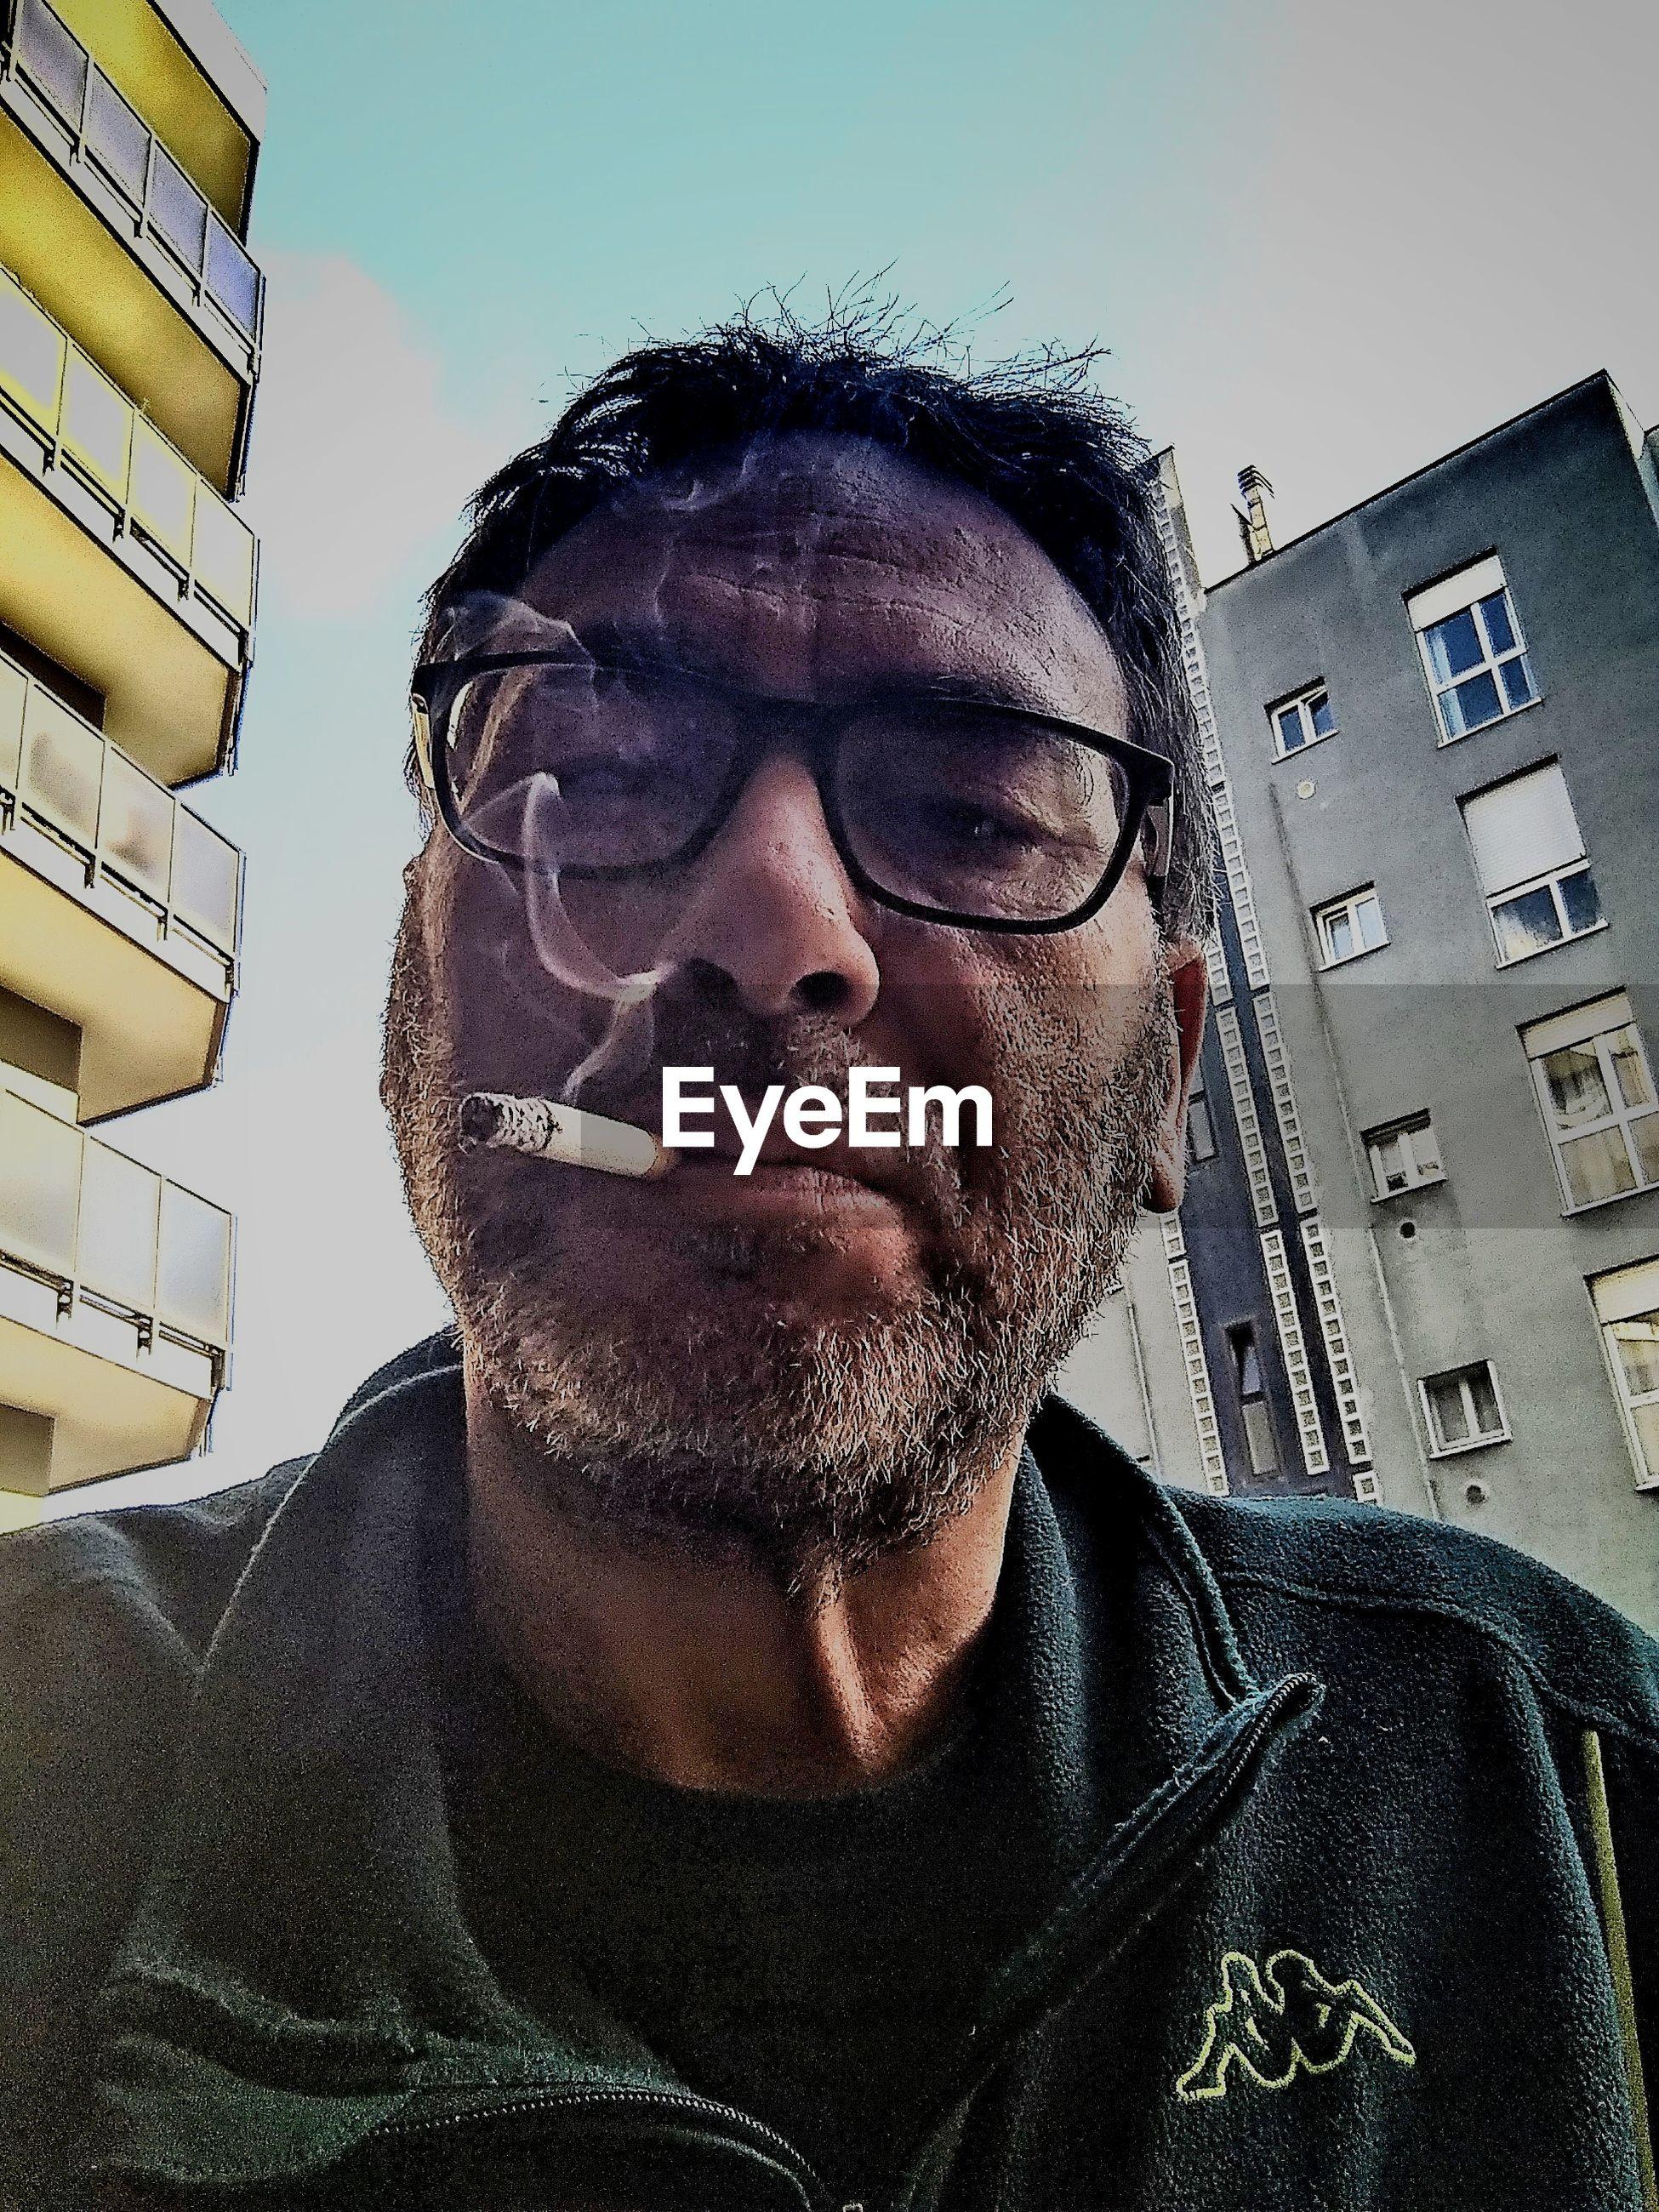 PORTRAIT OF MID ADULT MAN WEARING EYEGLASSES